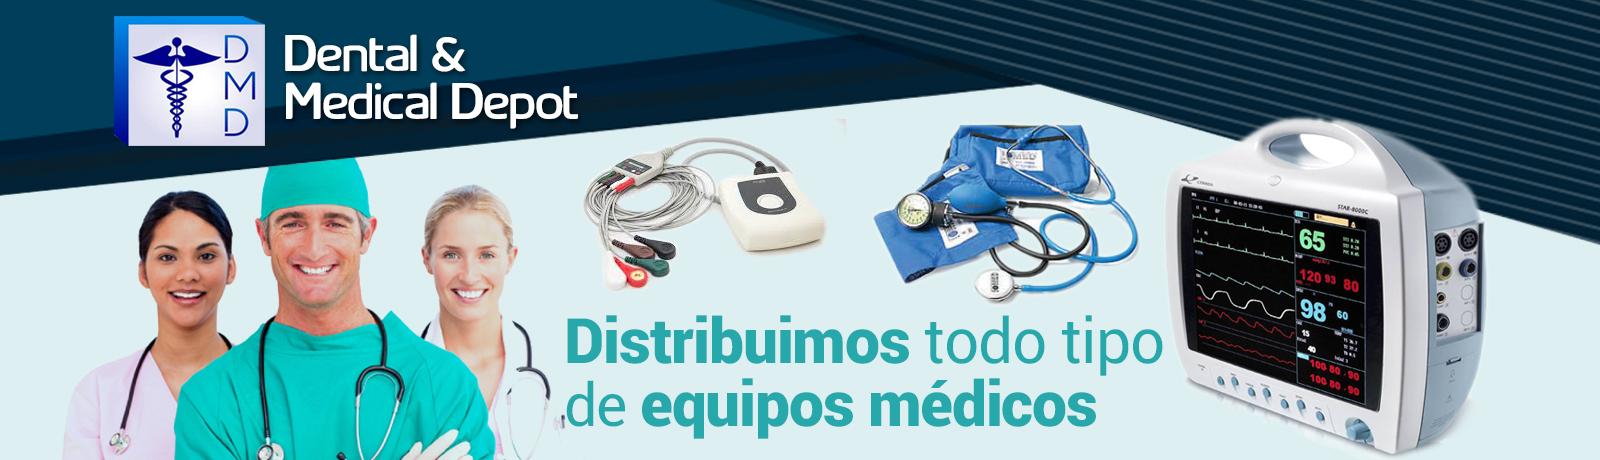 Banner-Equipos-Medicos-DMD